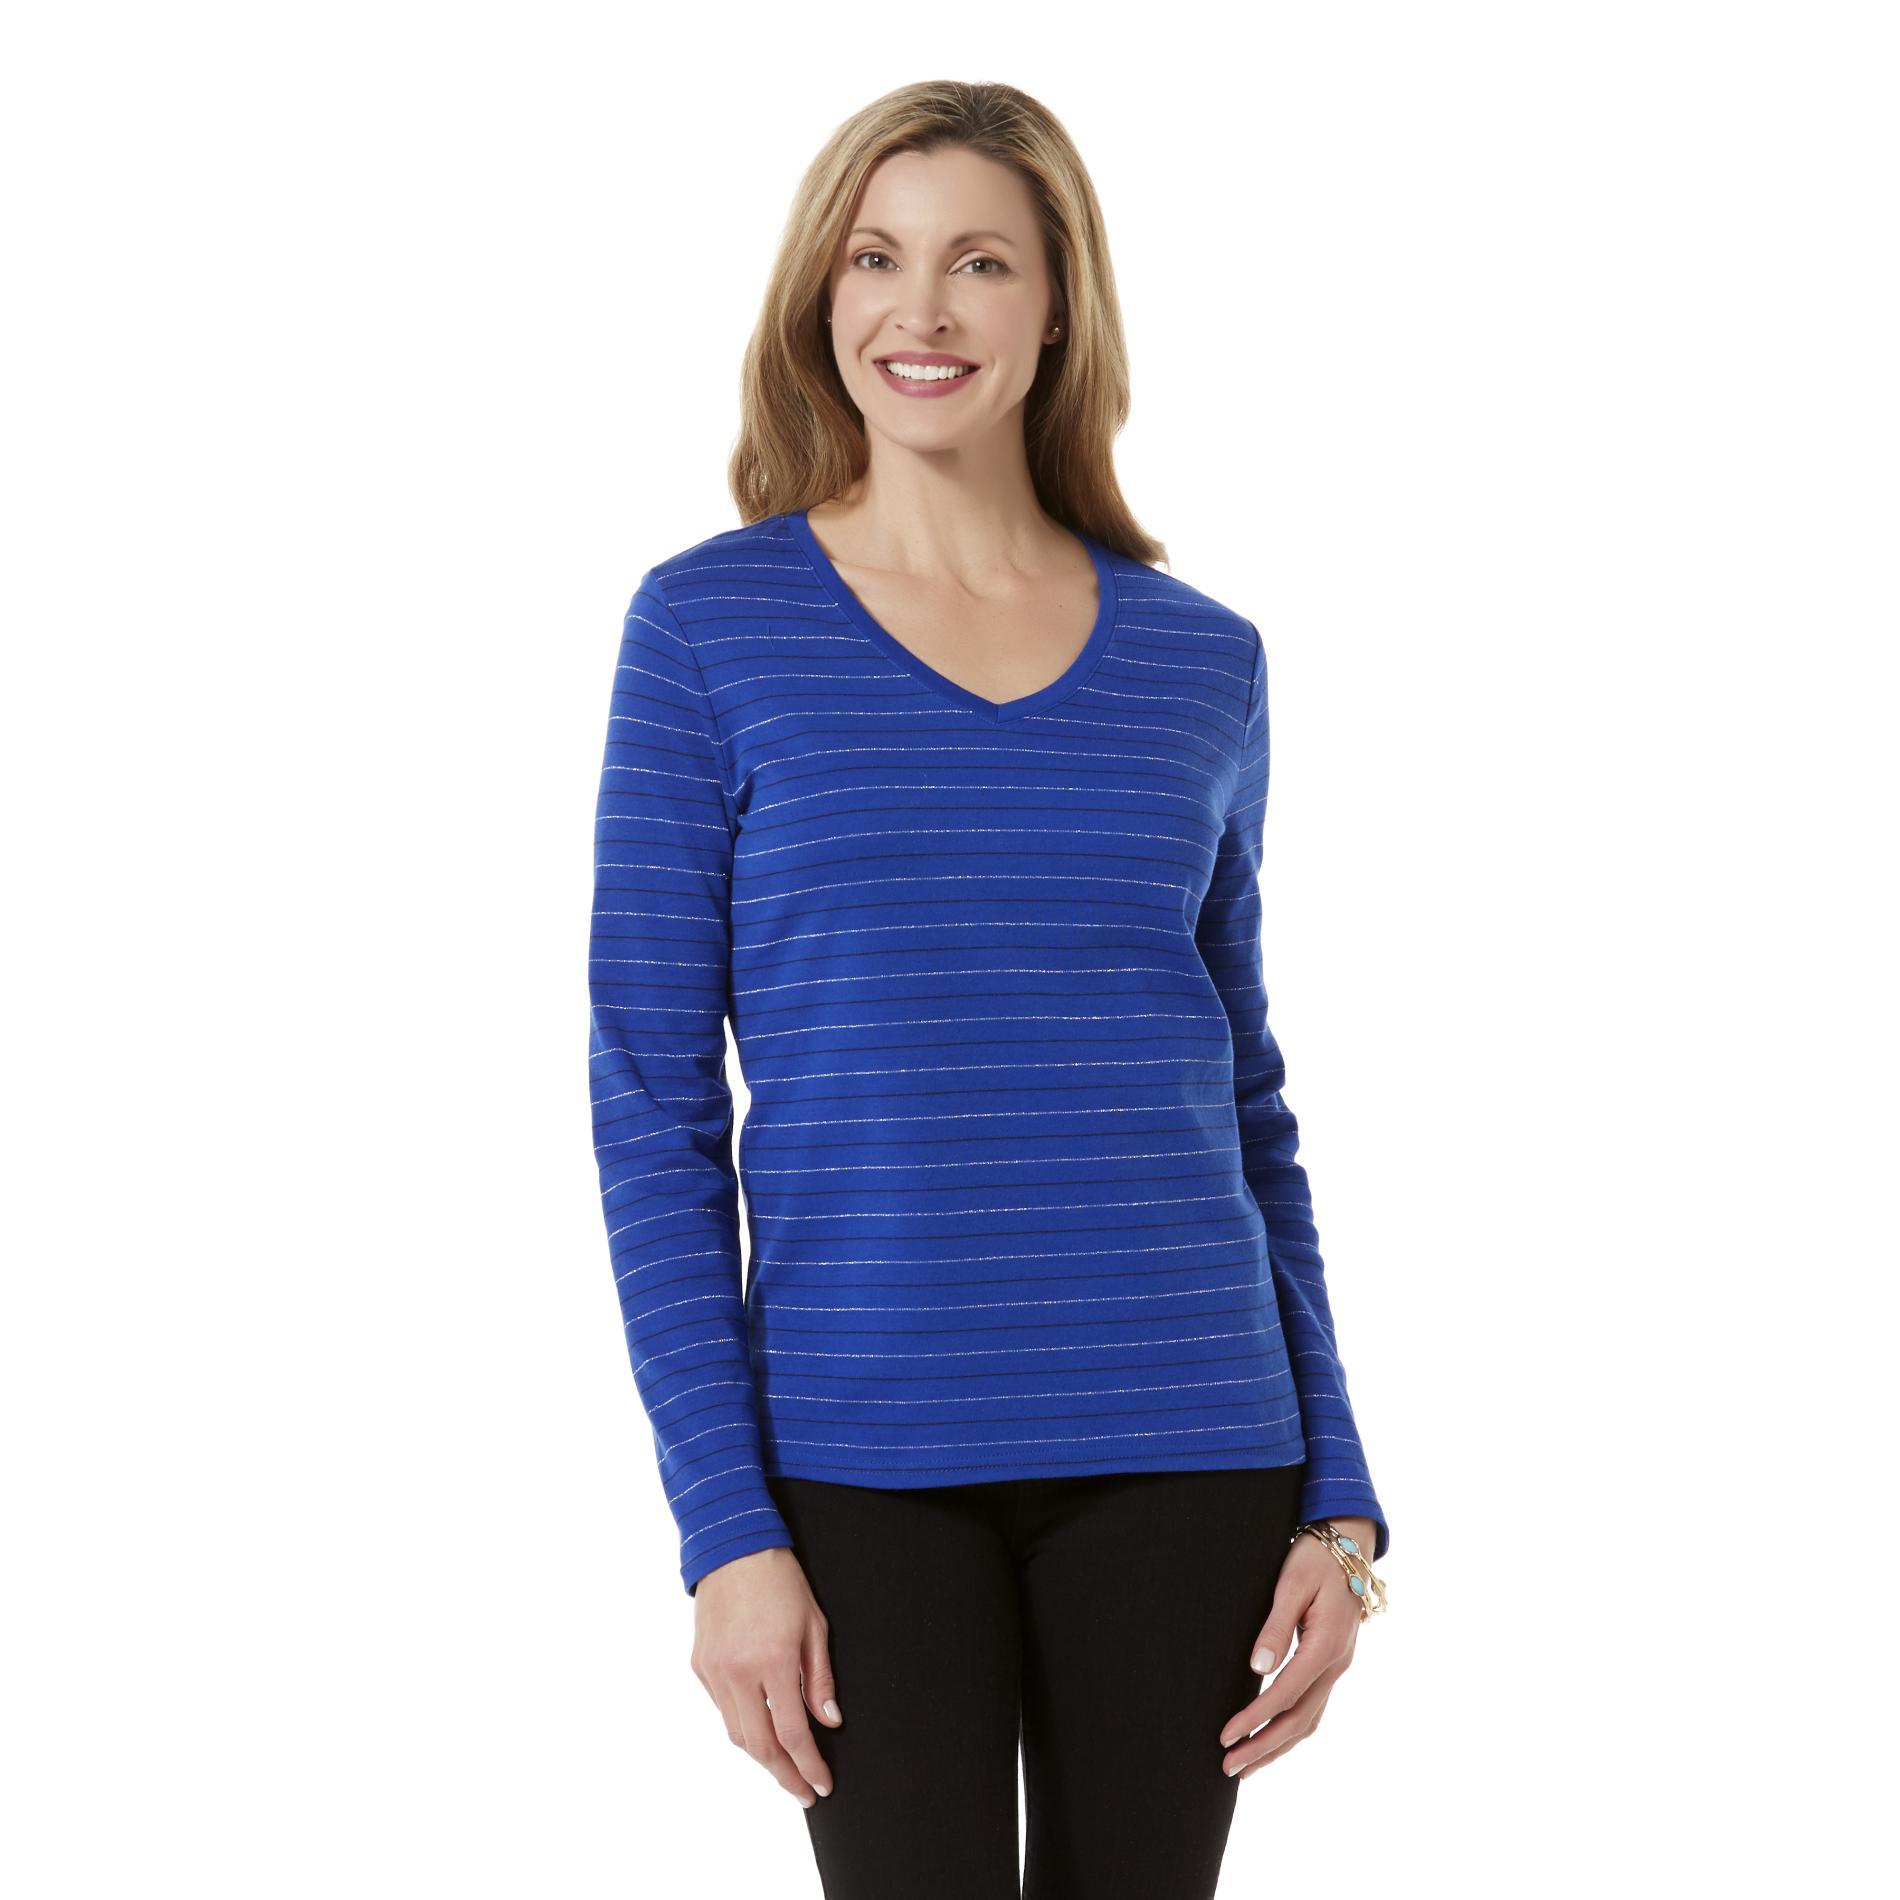 Basic Editions Women's Long-Sleeve T-Shirt - Striped